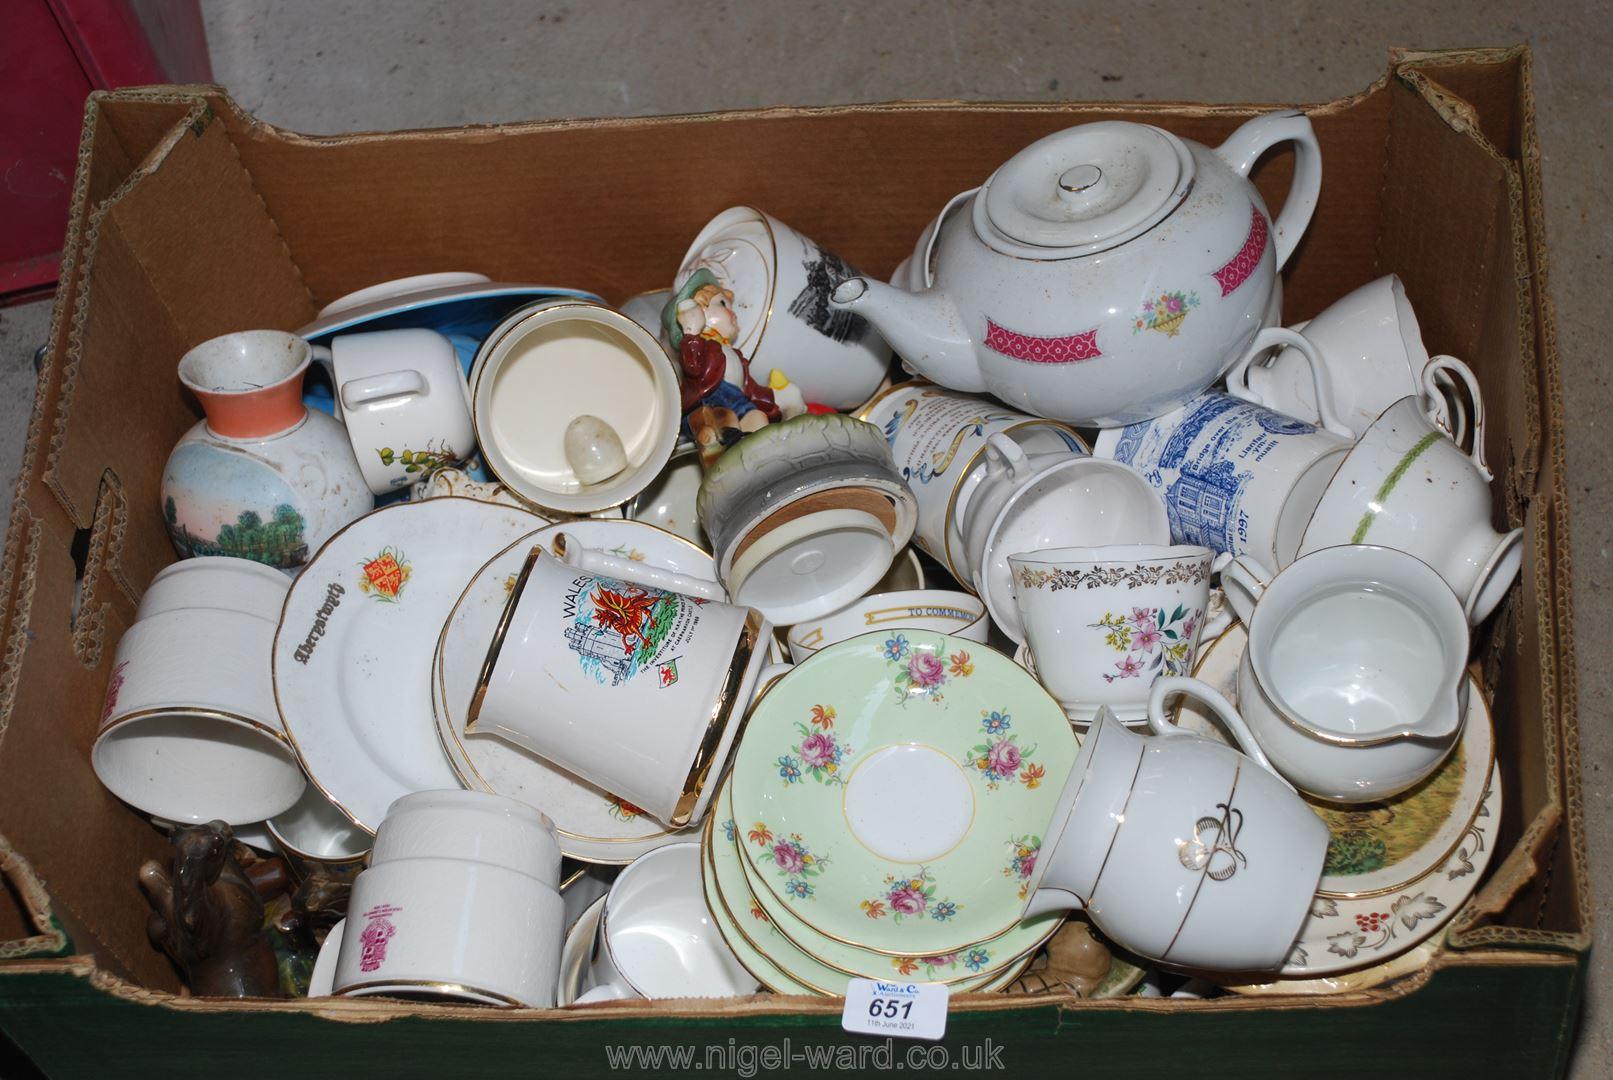 A box of various mugs, jugs, teapot etc.